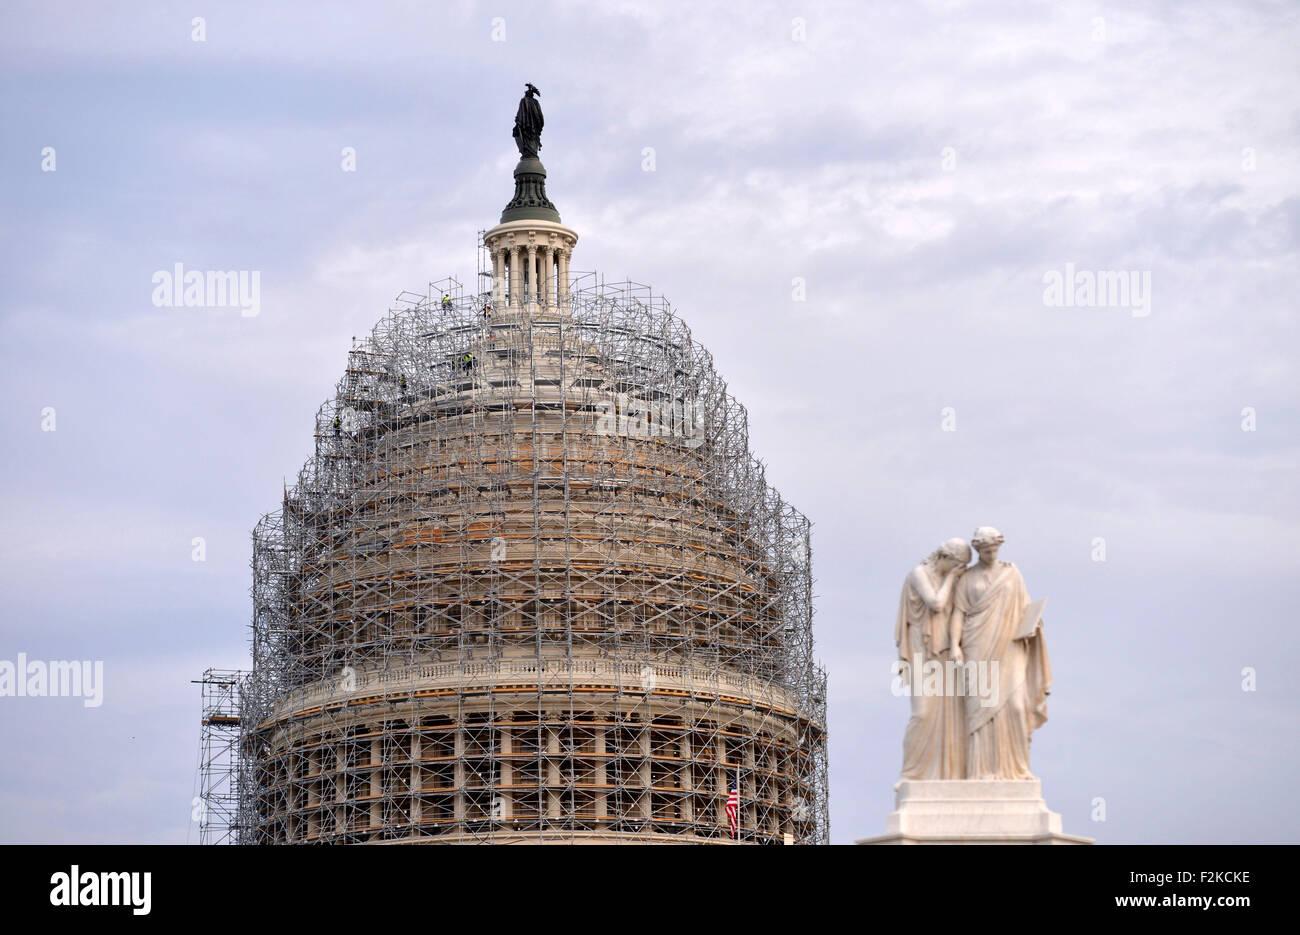 (150921) -- WASHINGTON D.C., Sept. 21, 2015 (Xinhua) -- File photo taken on Nov. 4, 2014 shows the Capitol in Washington, - Stock Image